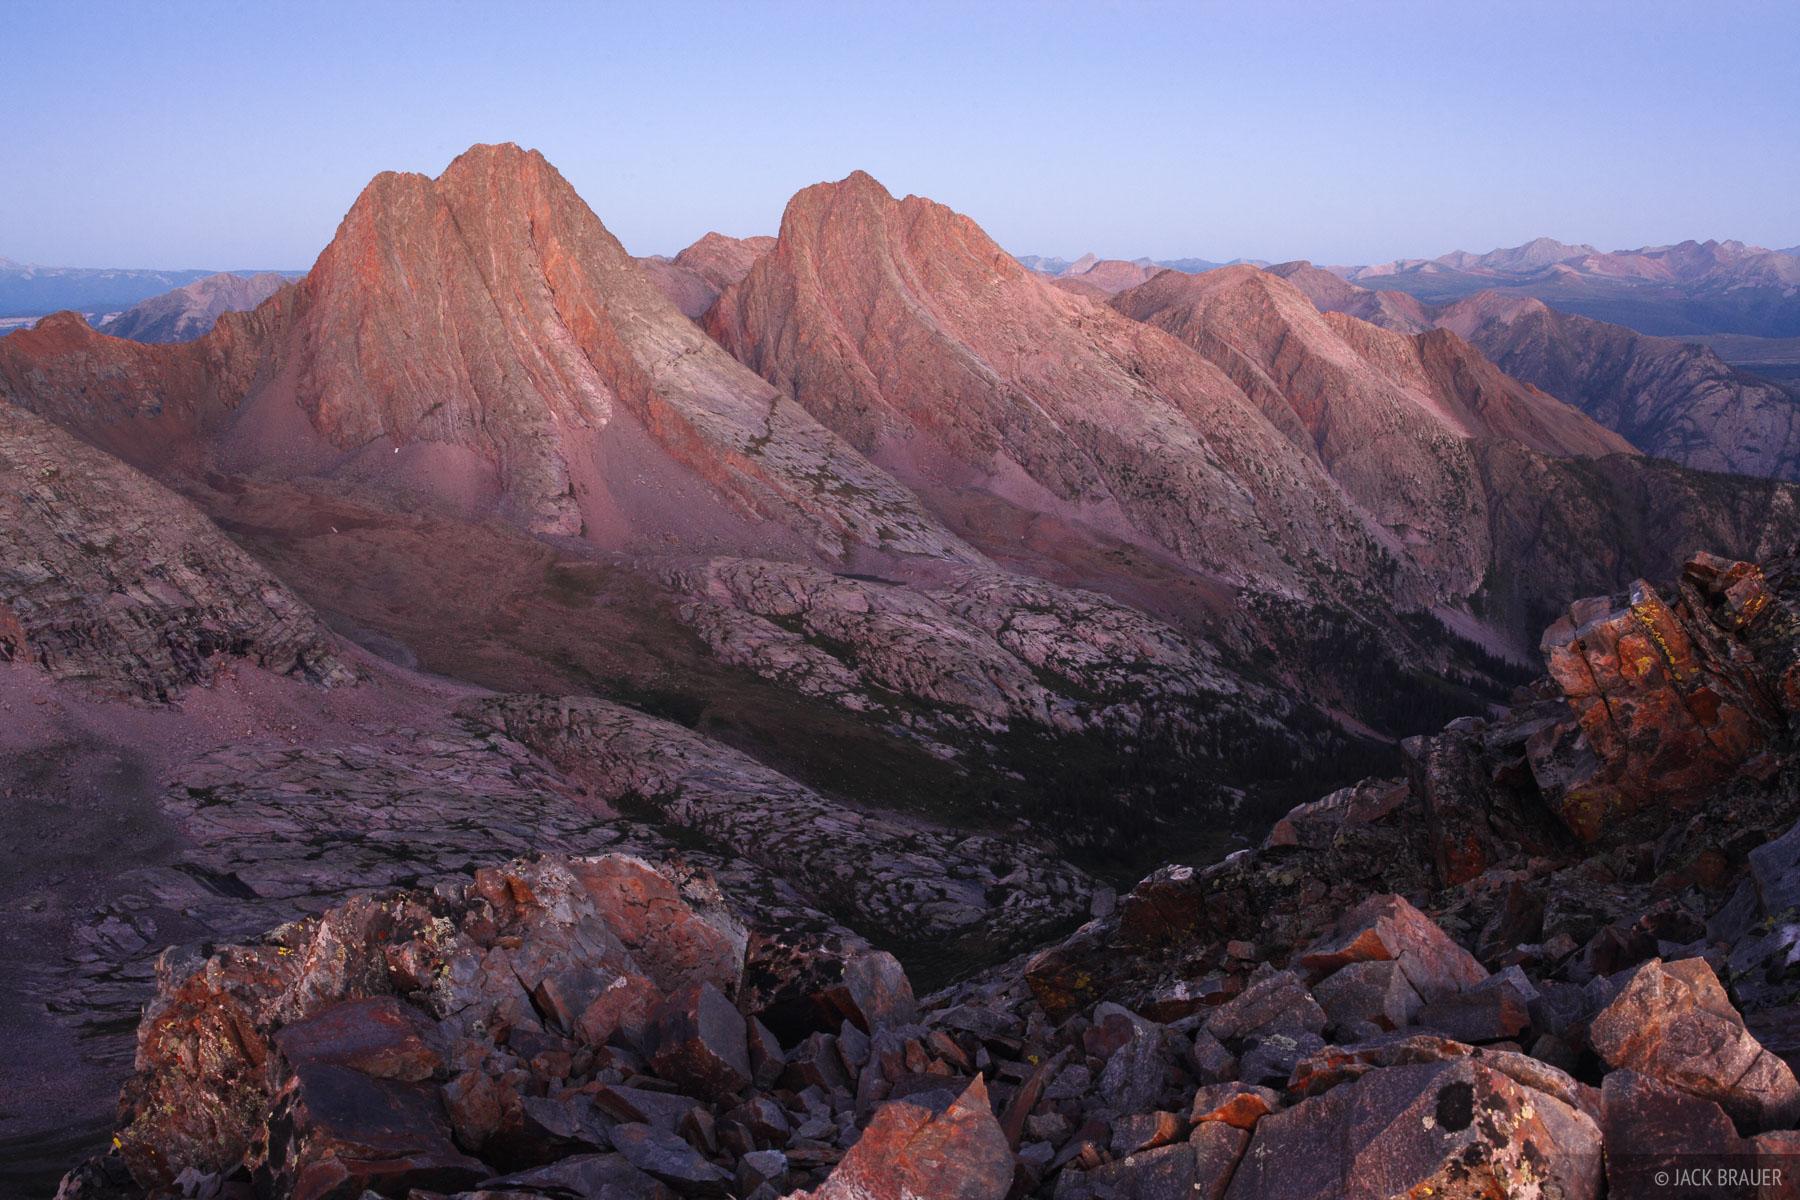 Dawn light on Vestal and Arrow Peaks in the Grenadier Range, Weminuche Wilderness - August.